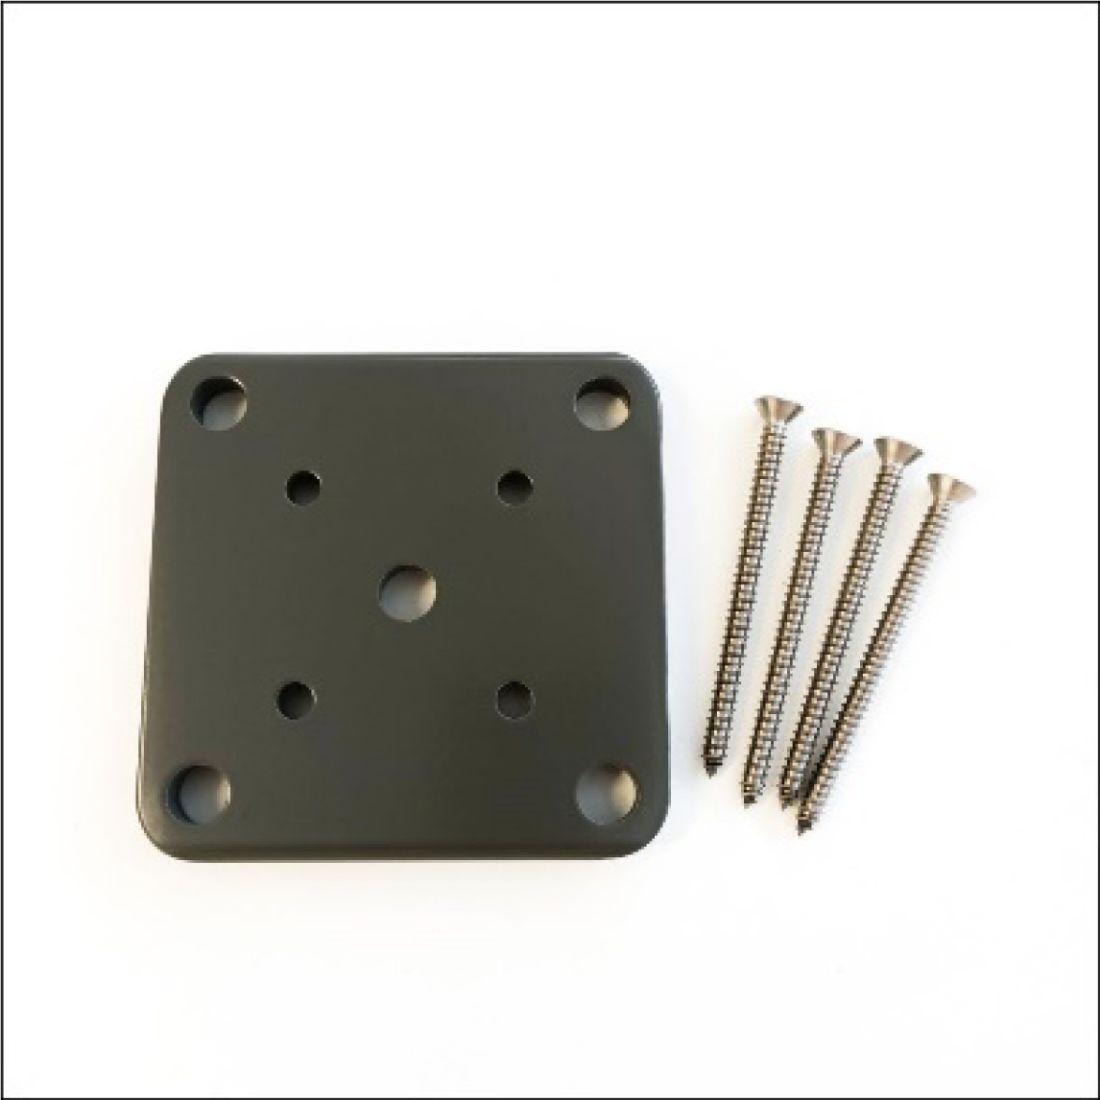 Base Plate Set Charcoal 65 x 65mm ELI-BASE-CHC-PLT65